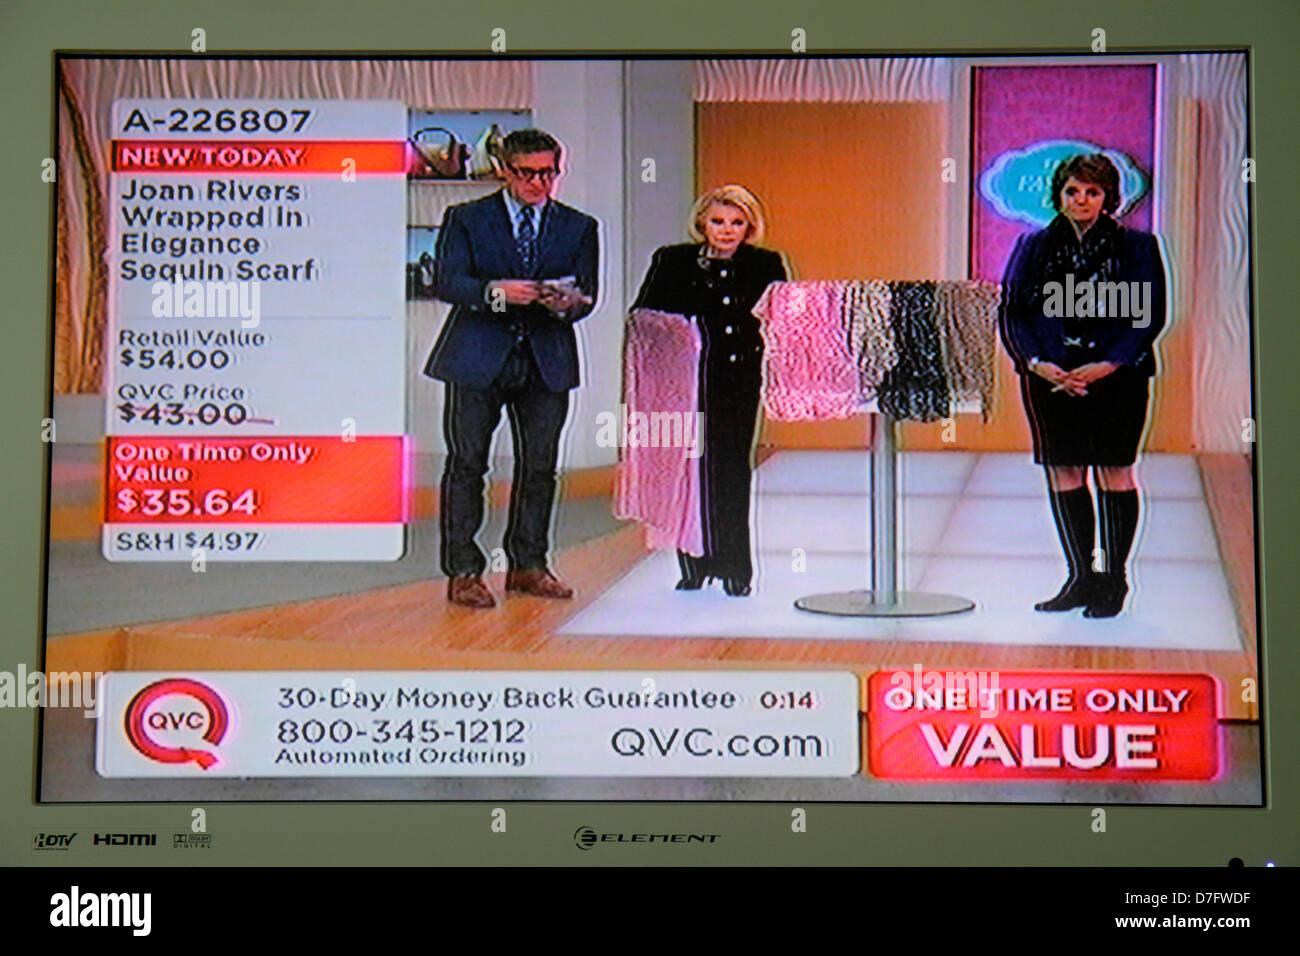 tv qvc. miami beach florida tv television screen flat panel hdtv monitor qvc home shopping toll-free tv qvc s